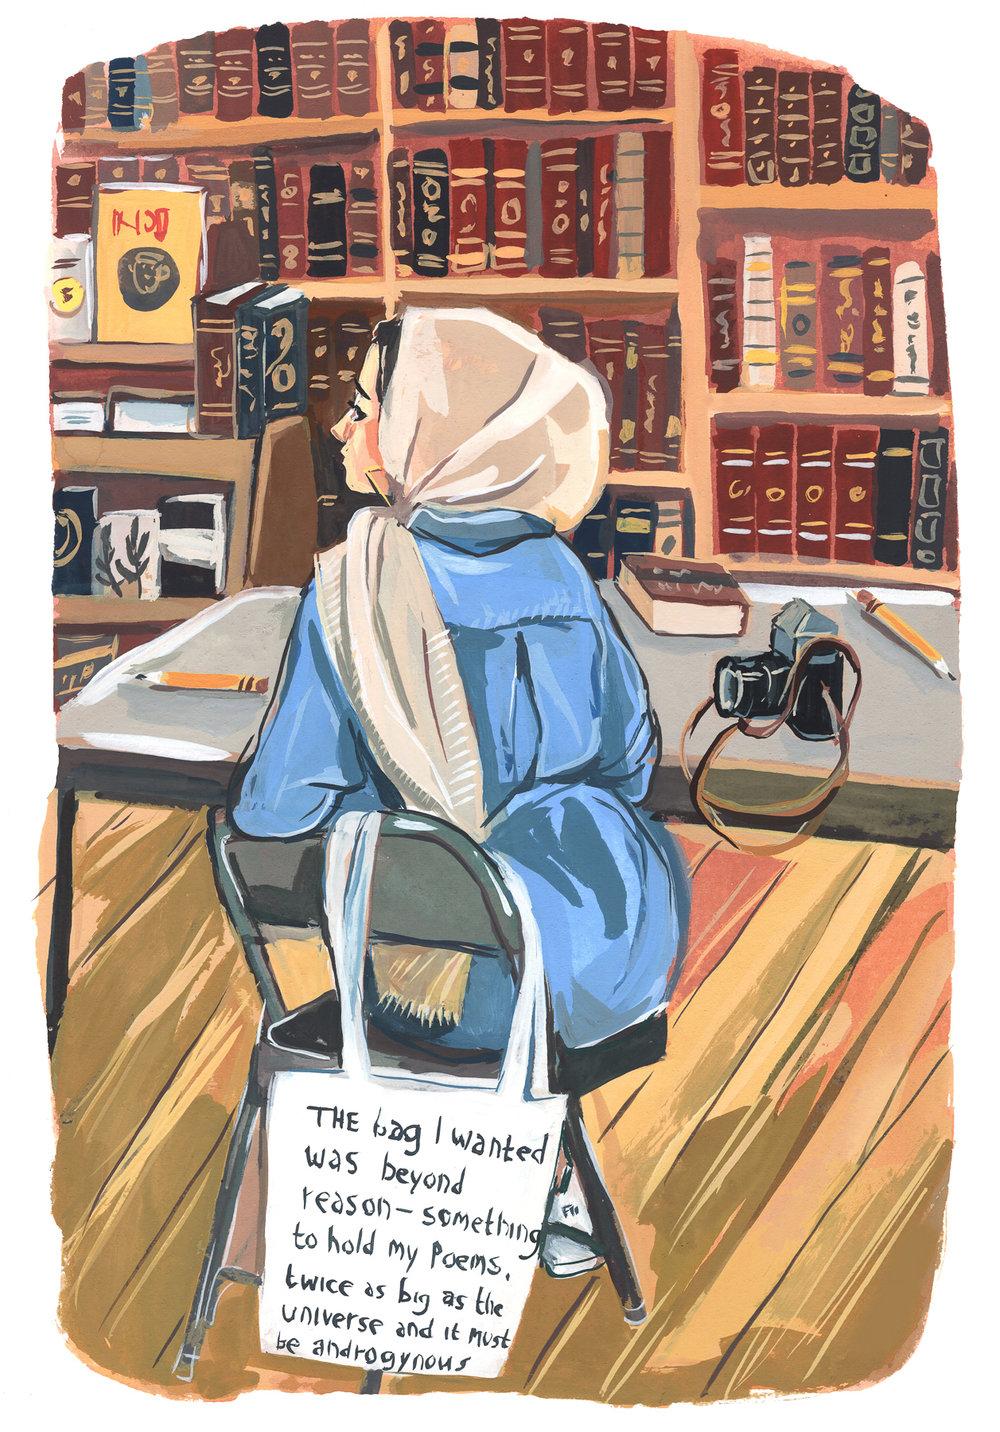 SOI 61 2018 - ARTIST: Jenny KroikTITLE: Chanelplague [1 of 7]